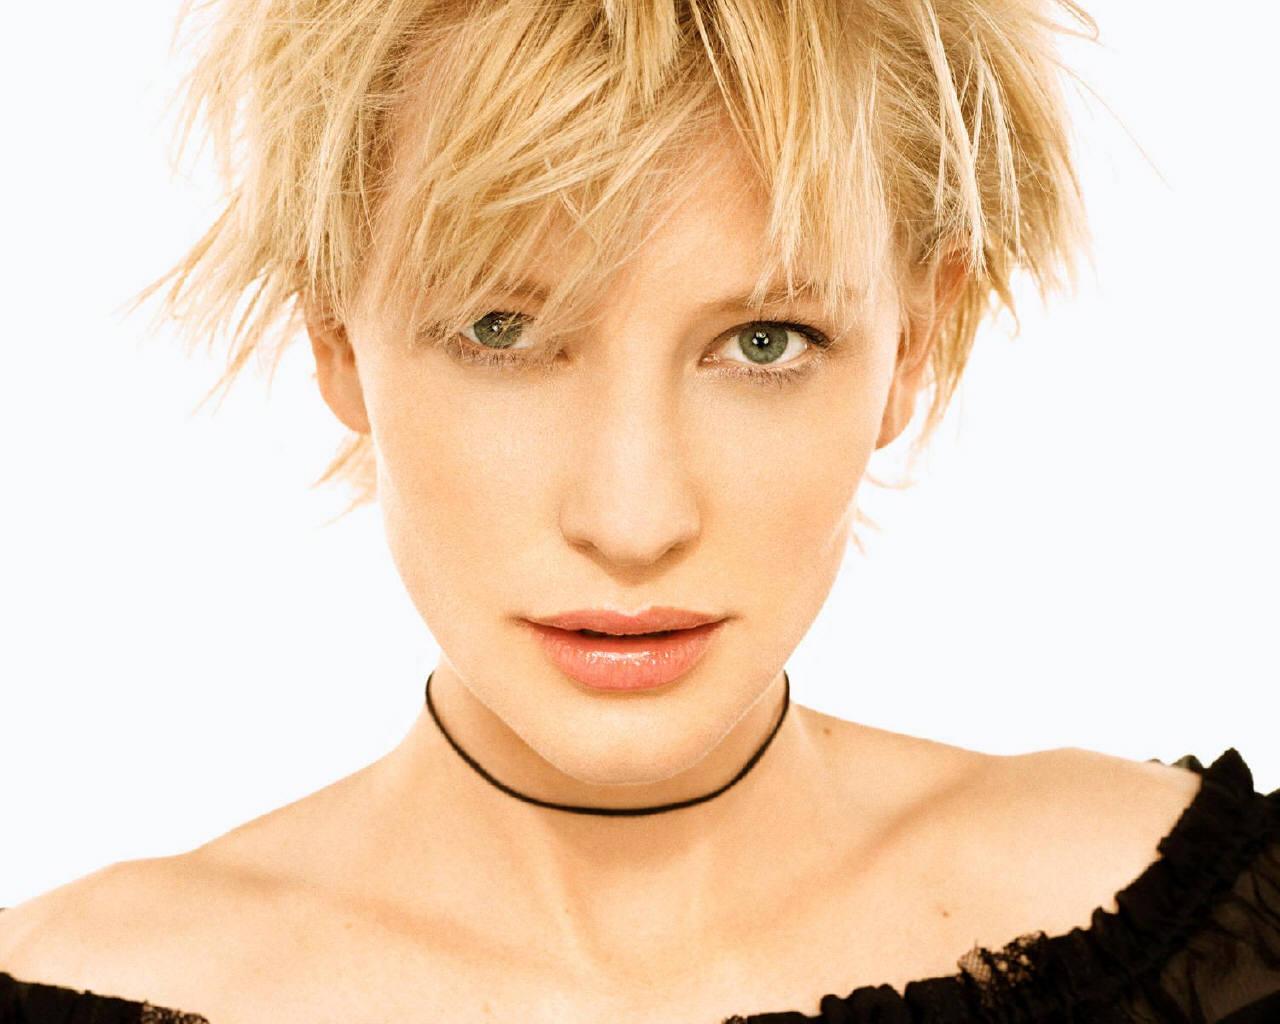 Kejt Blanšet - Page 2 Cate-Blanchett-cate-blanchett-222439_1280_1024